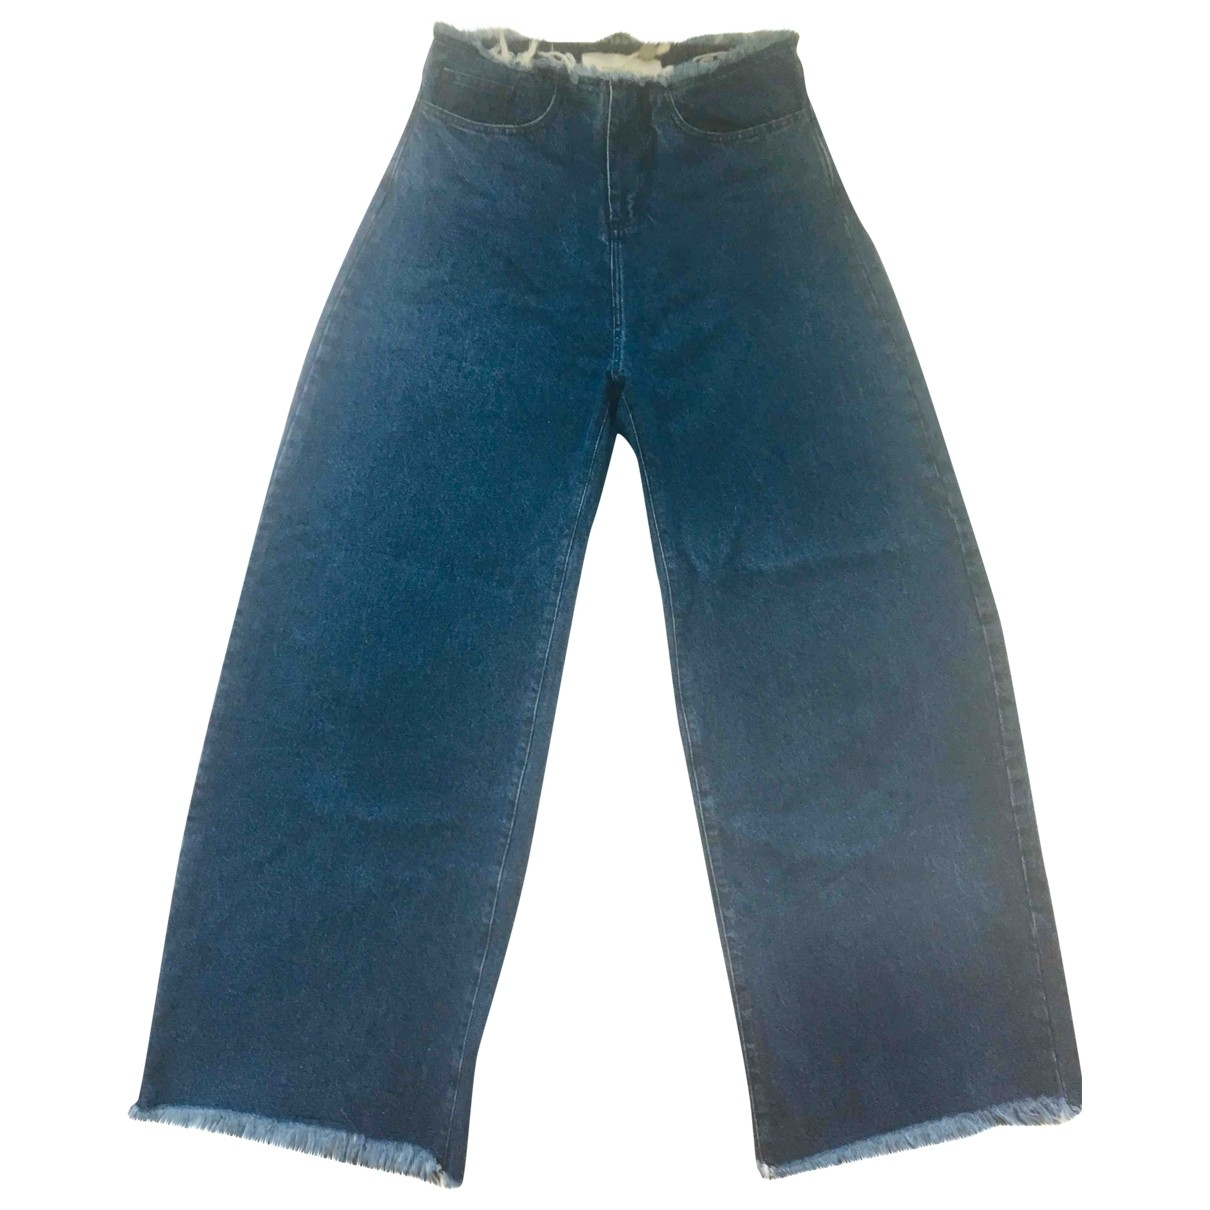 Marques Almeida \N Blue Denim - Jeans Jeans for Women 36 FR